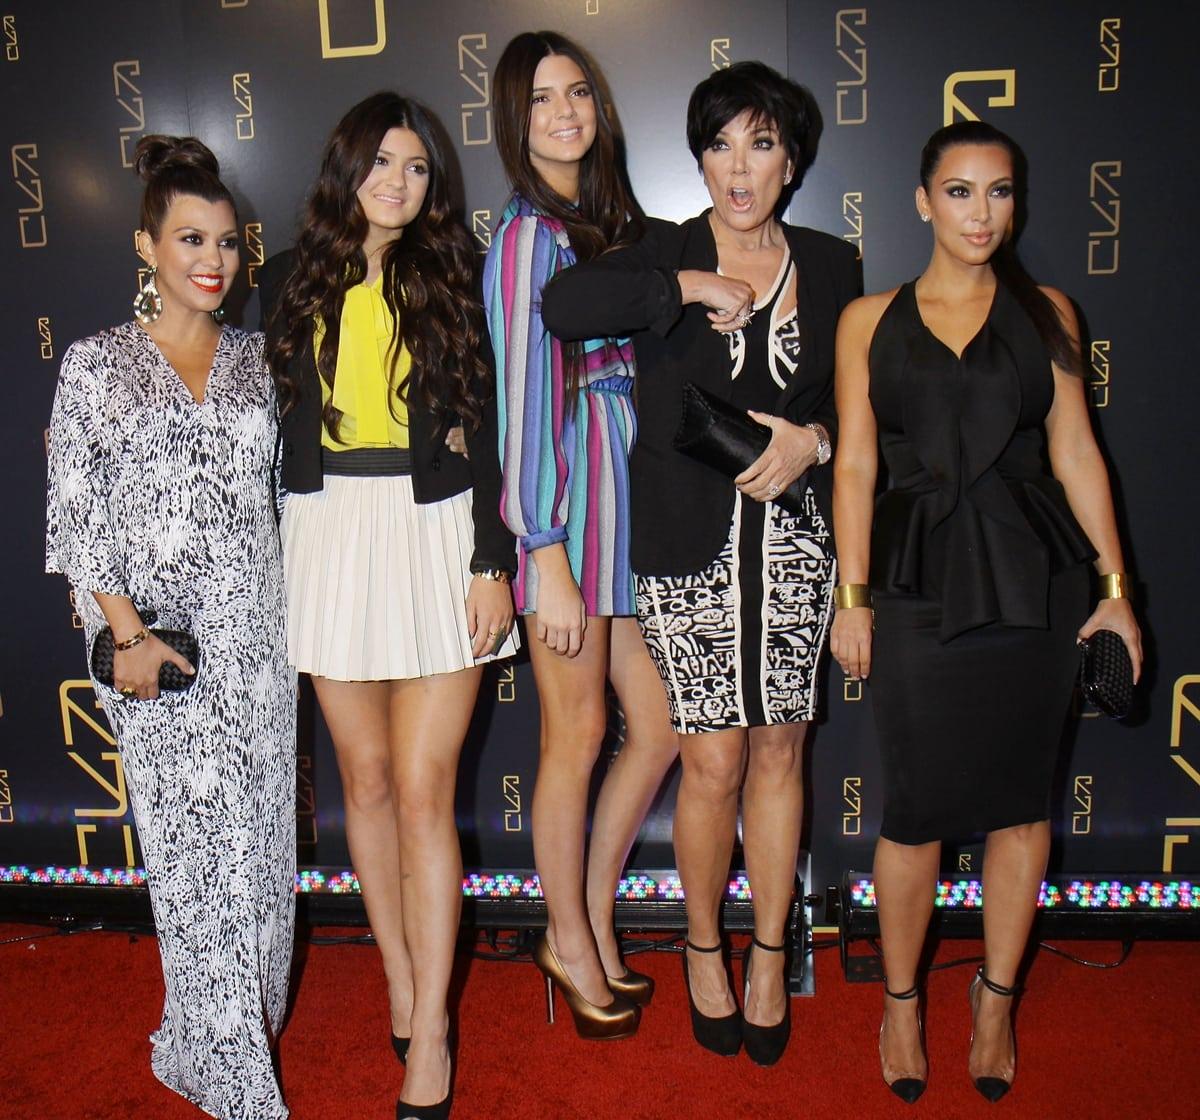 Kylie Jenner, Kendall Jenner, Kris Jenner, and Kim Kardashian like to make fun of Kourtney Kardashian's short height